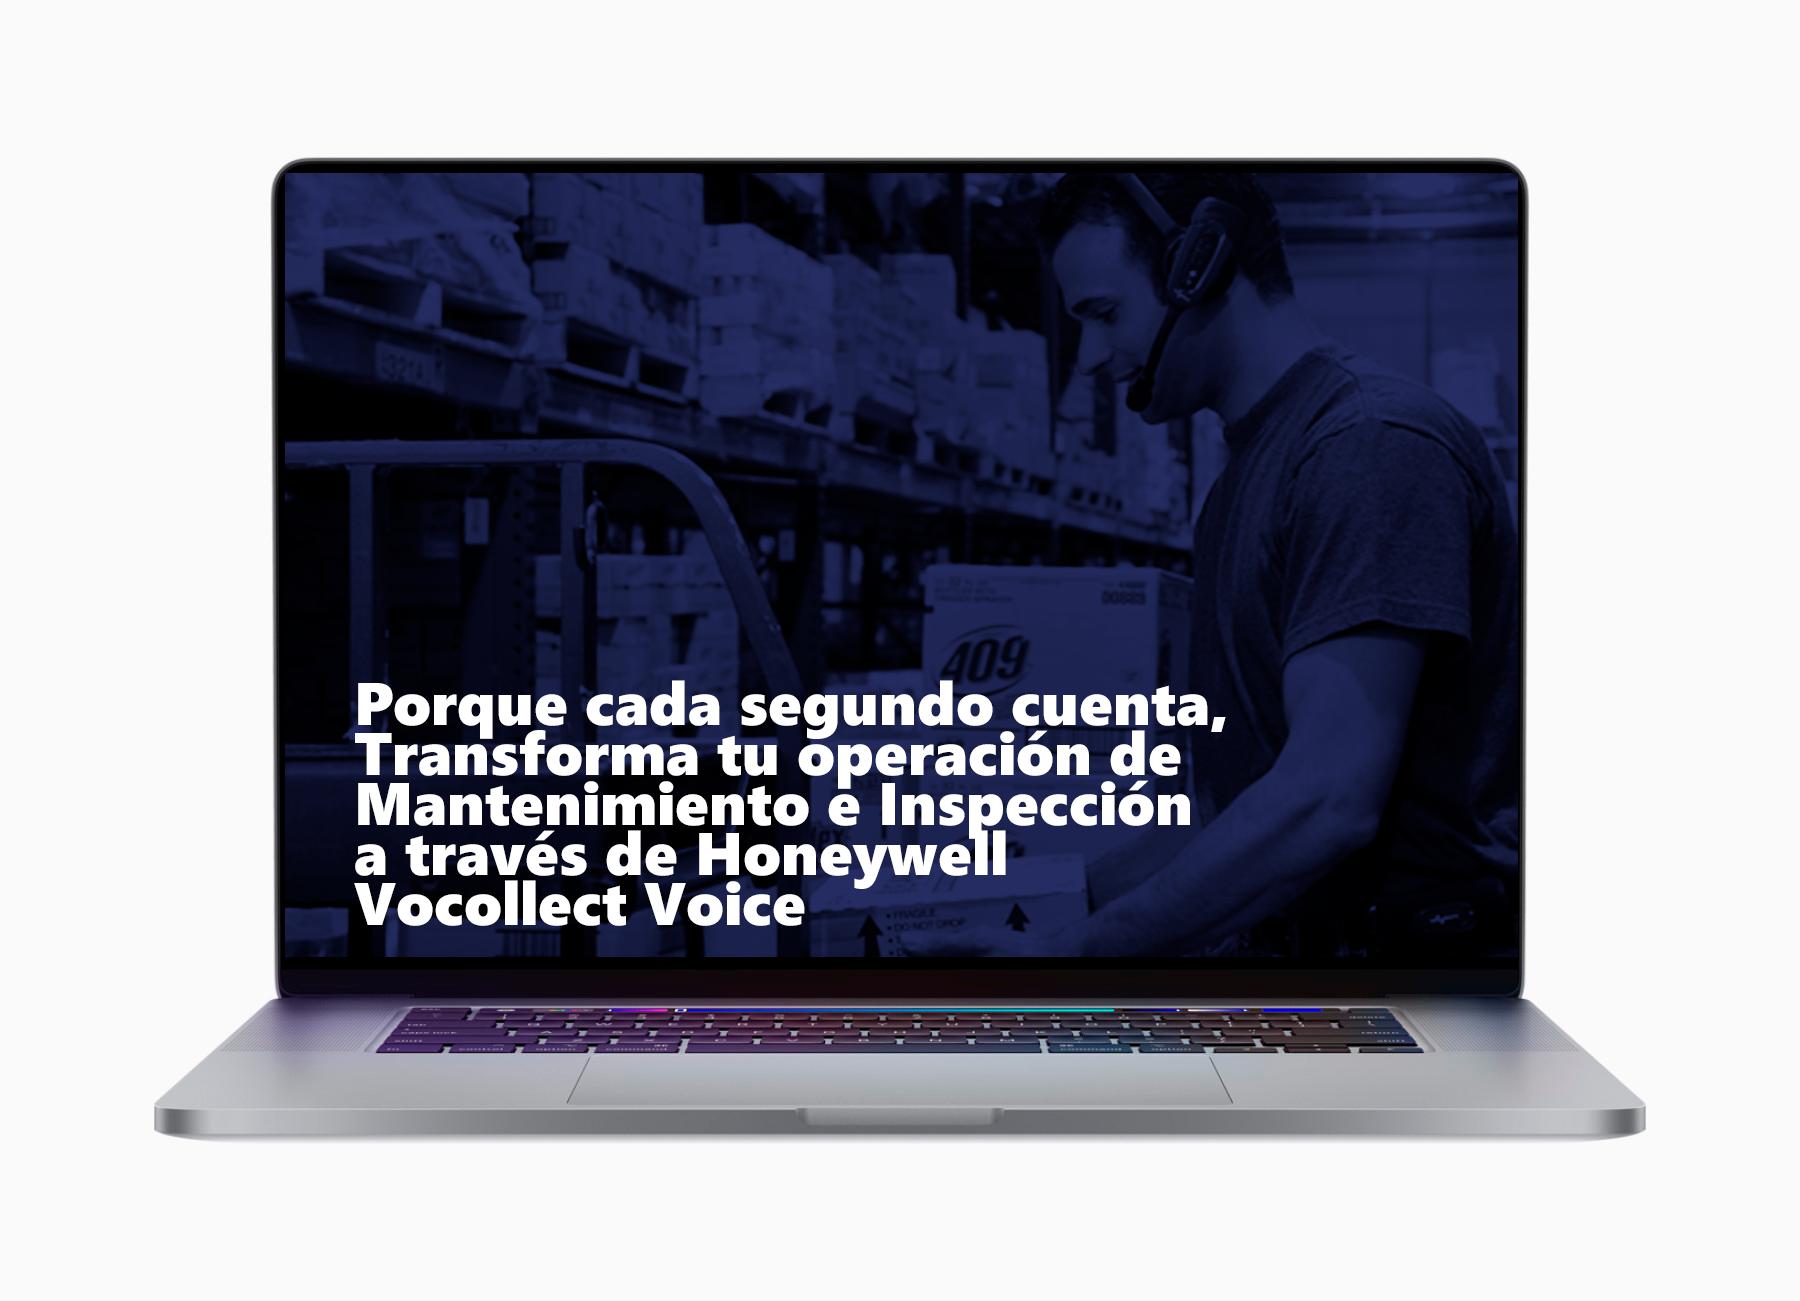 webinar-lap-Porque-cada-segundo-cuenta-Transforma-tu-operación-de-Mantenimiento-e-Inspección-a-través-de-Honeywell-Vocollect-Voice